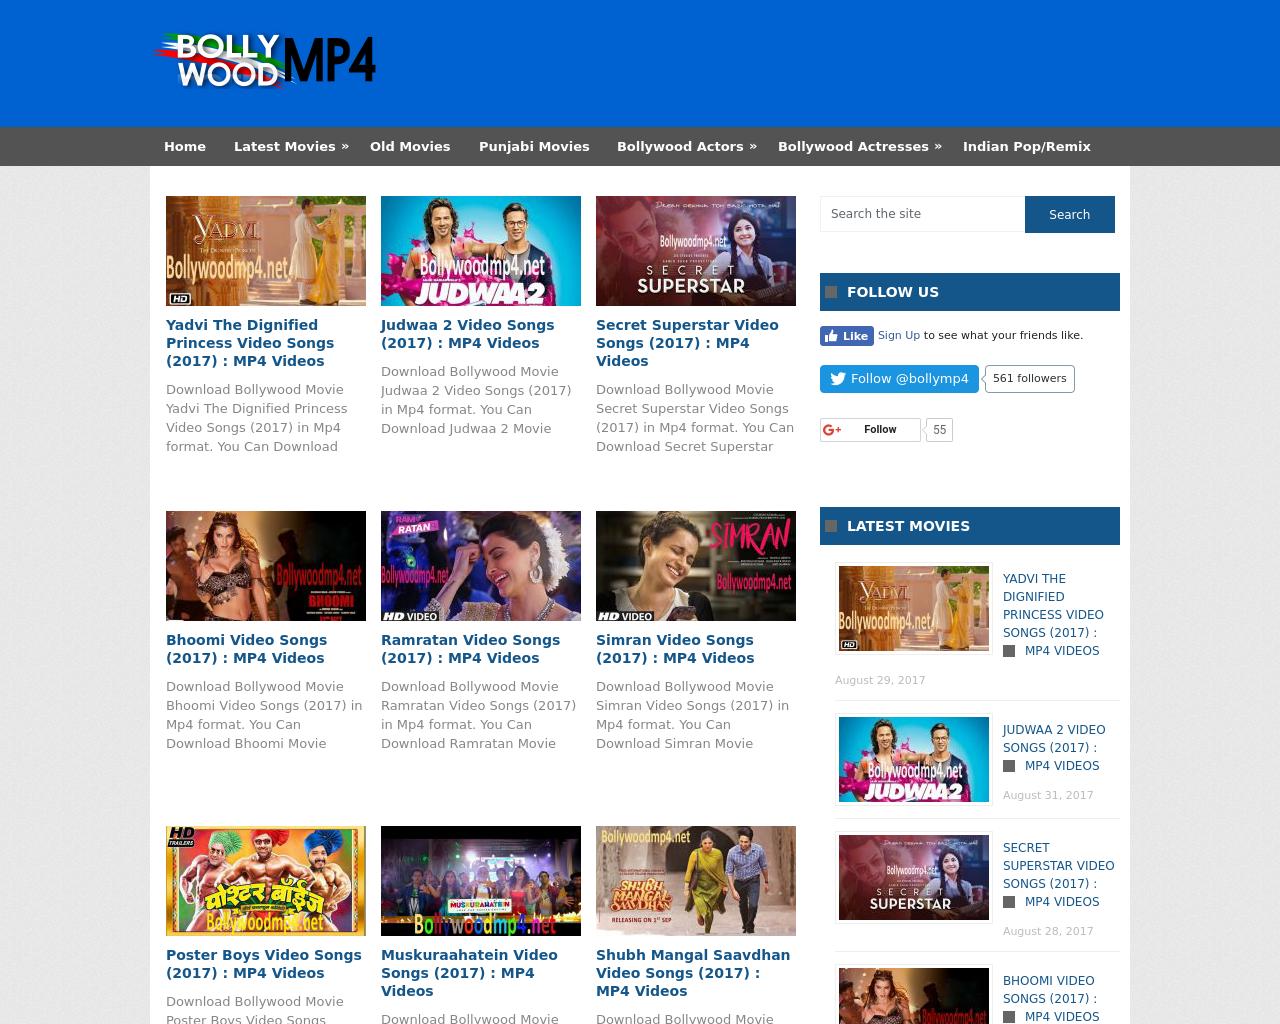 Bollywood-Mp4-Advertising-Reviews-Pricing